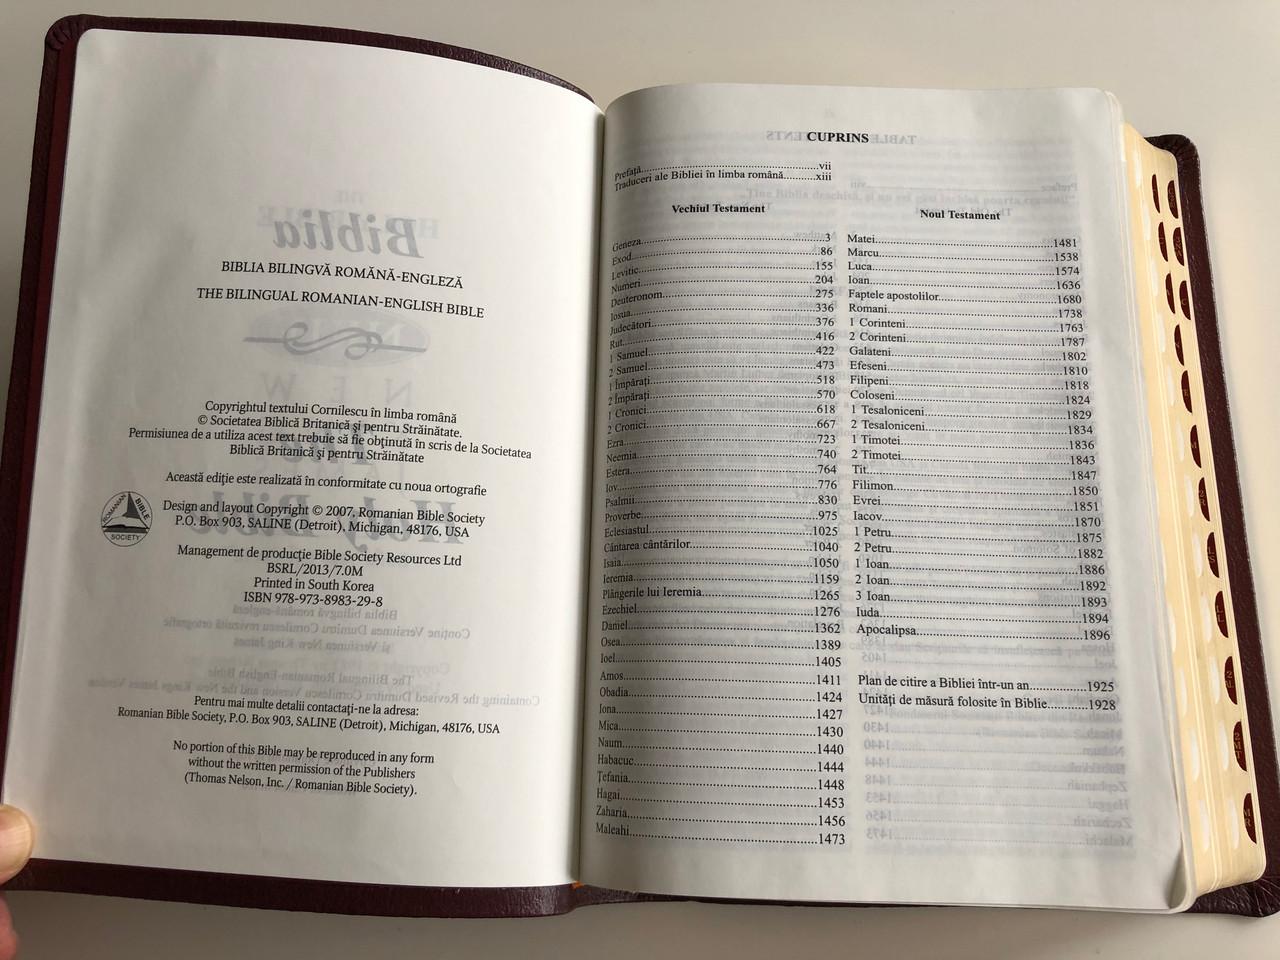 Romanian - English Bilingual Holy Bible RDCV - NKJV / Burgundy / Genuine  Leather Bound / Biblia Bilingvă Romănă - Engleză / Golden Edges, Thumb